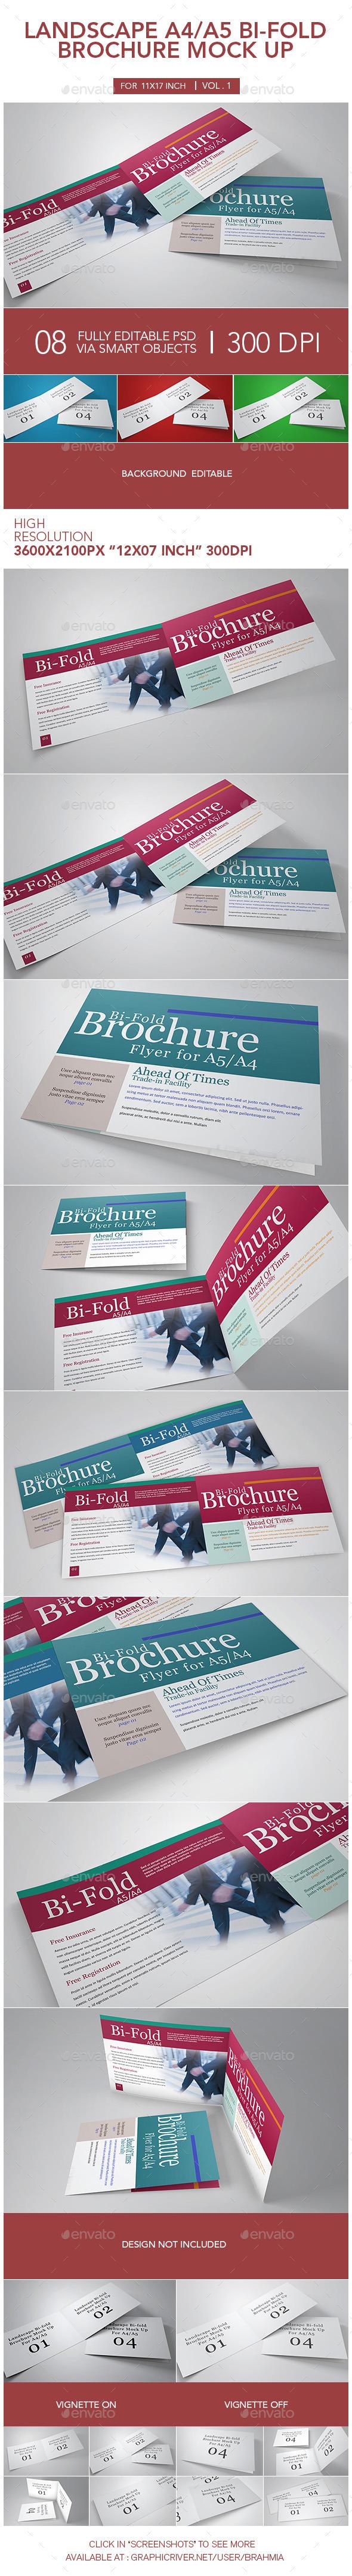 Landscape A4_A5 Bi-fold Brochure Mock Up - Brochures Print